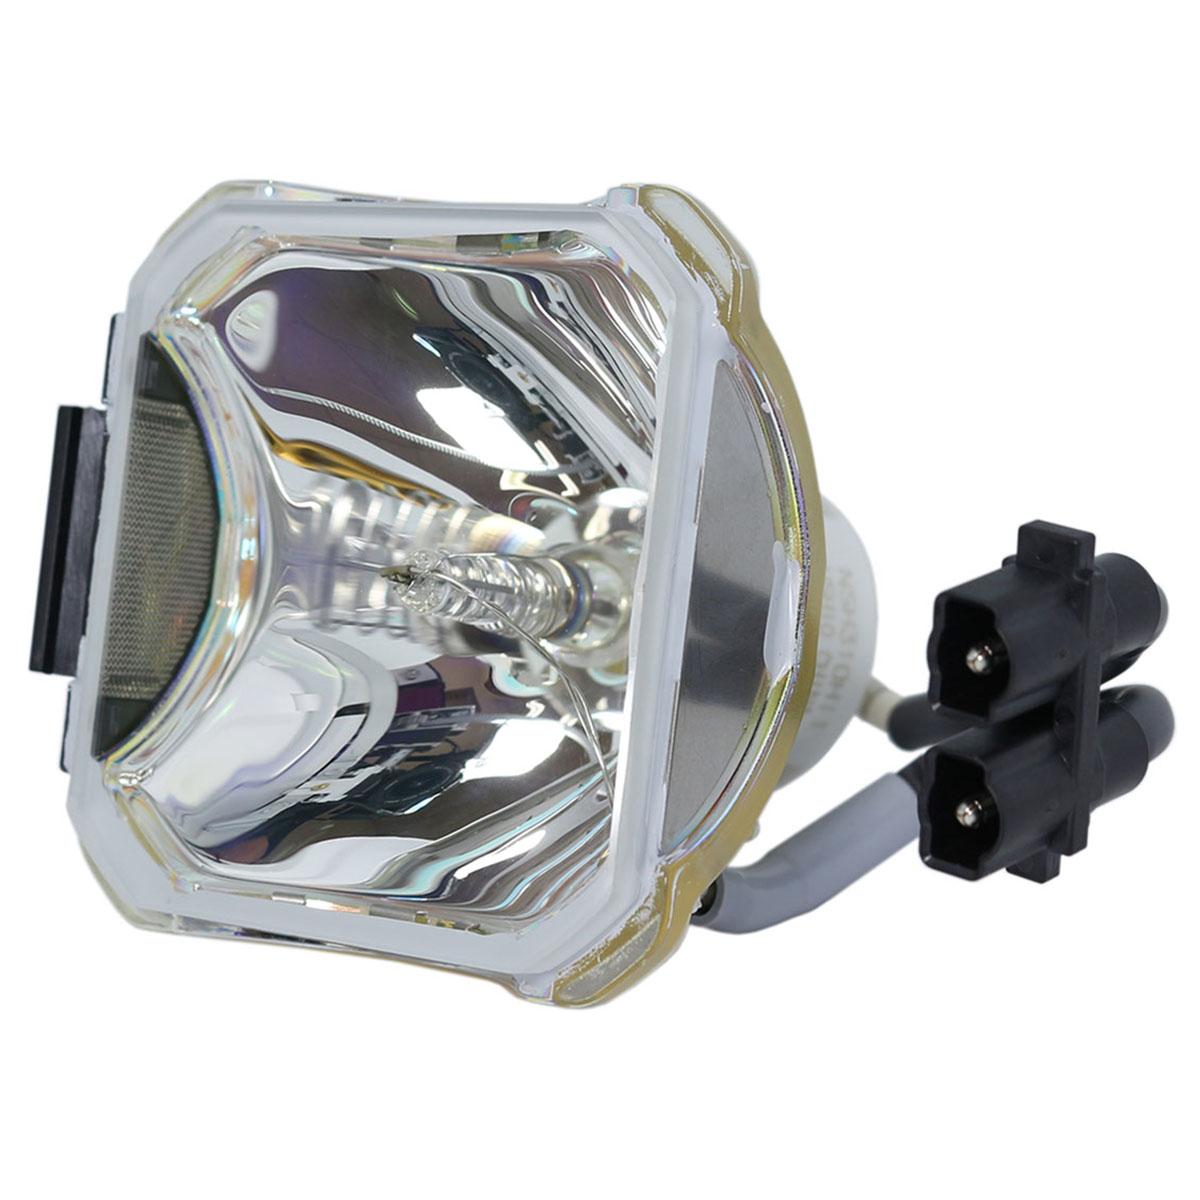 Ushio Original Bare Lamp For Hitachi HCP7500X Projector D...